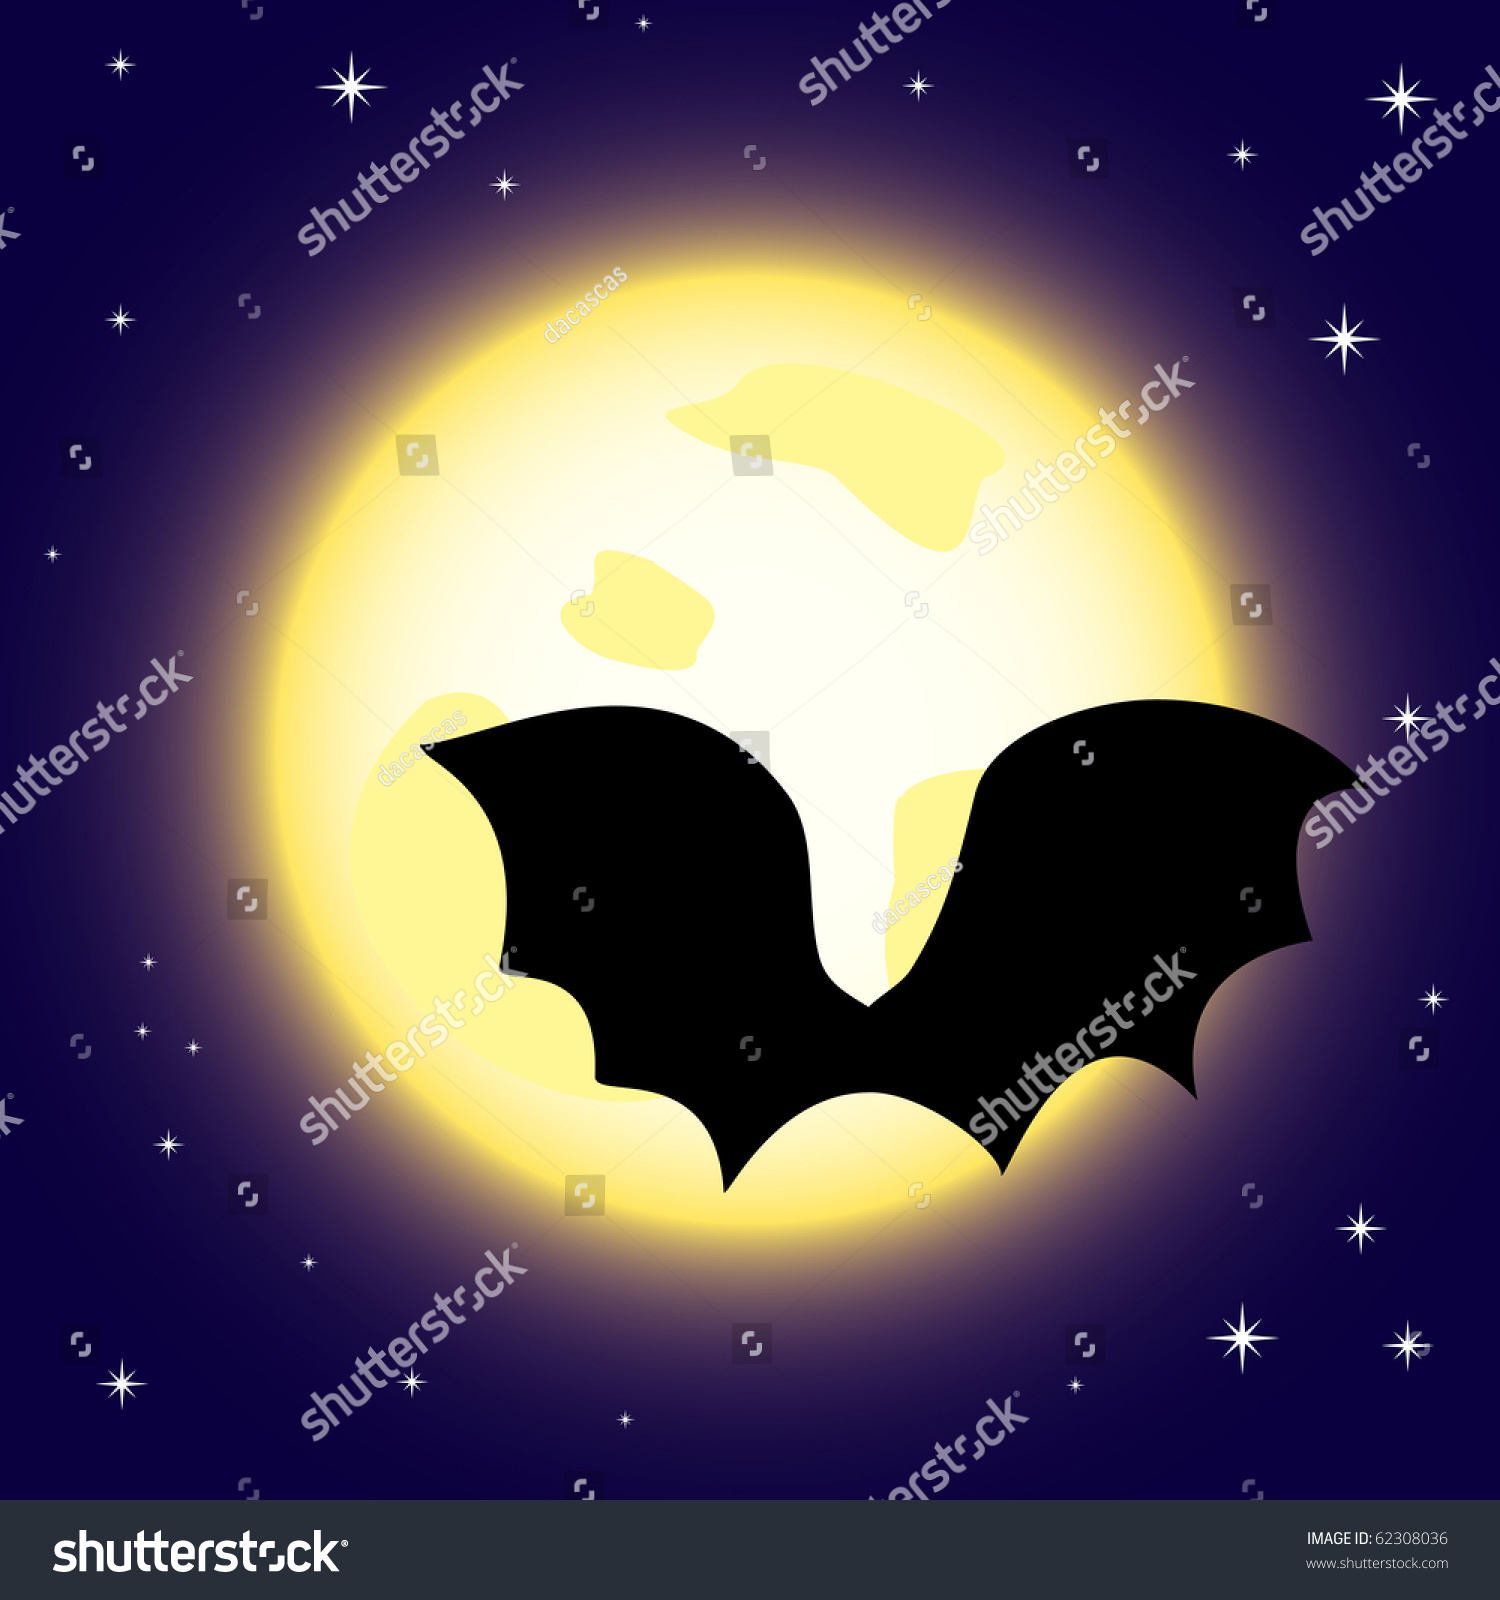 Vector Illustration Cartoon Moon Bats Silhouette Stock Vector